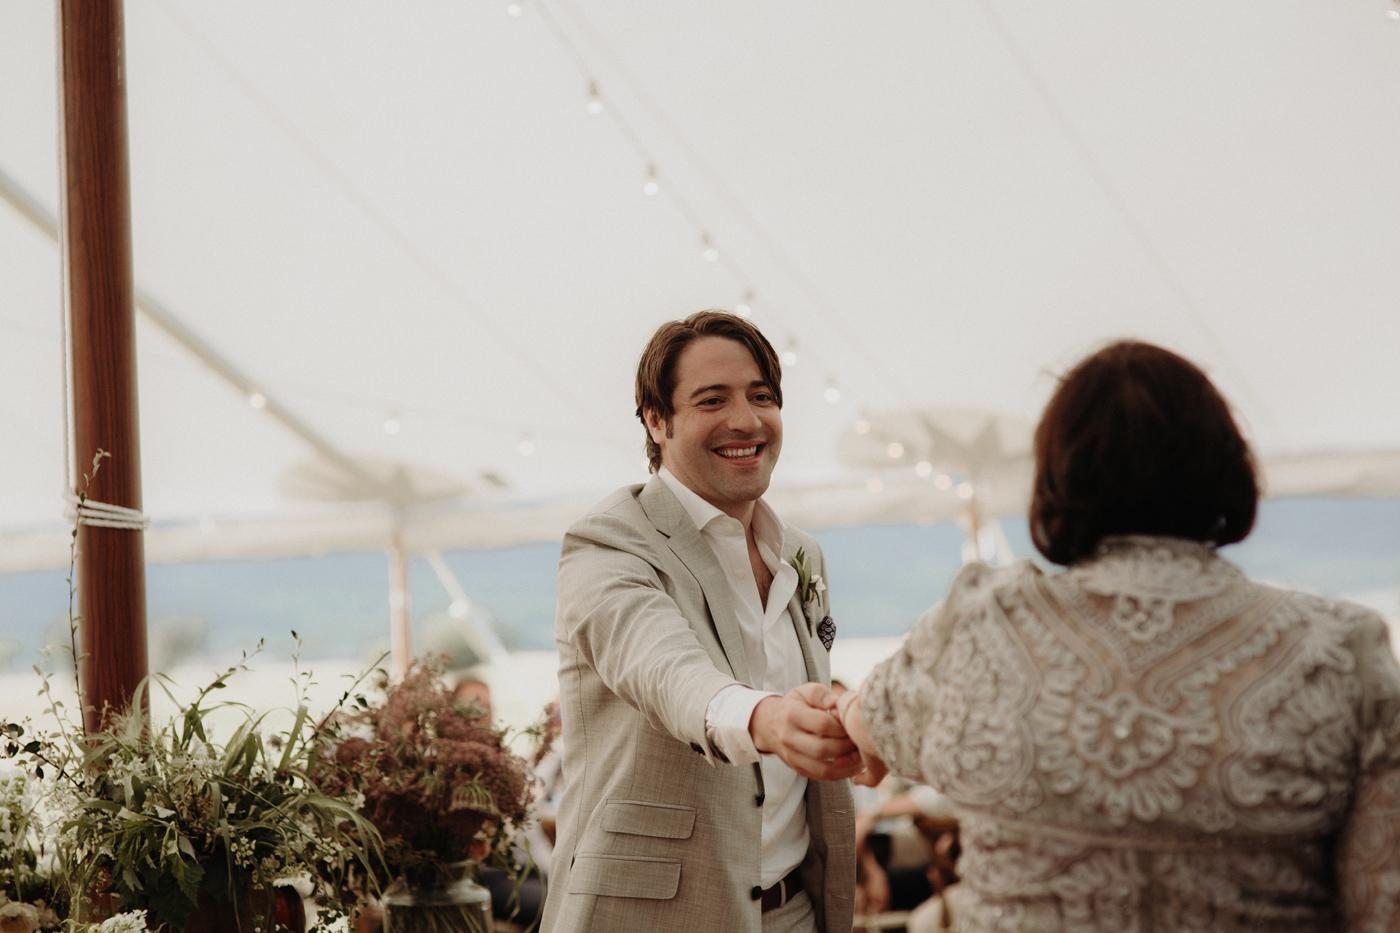 077-grand-teton-jackson-hole-wyoming-wedding.jpg